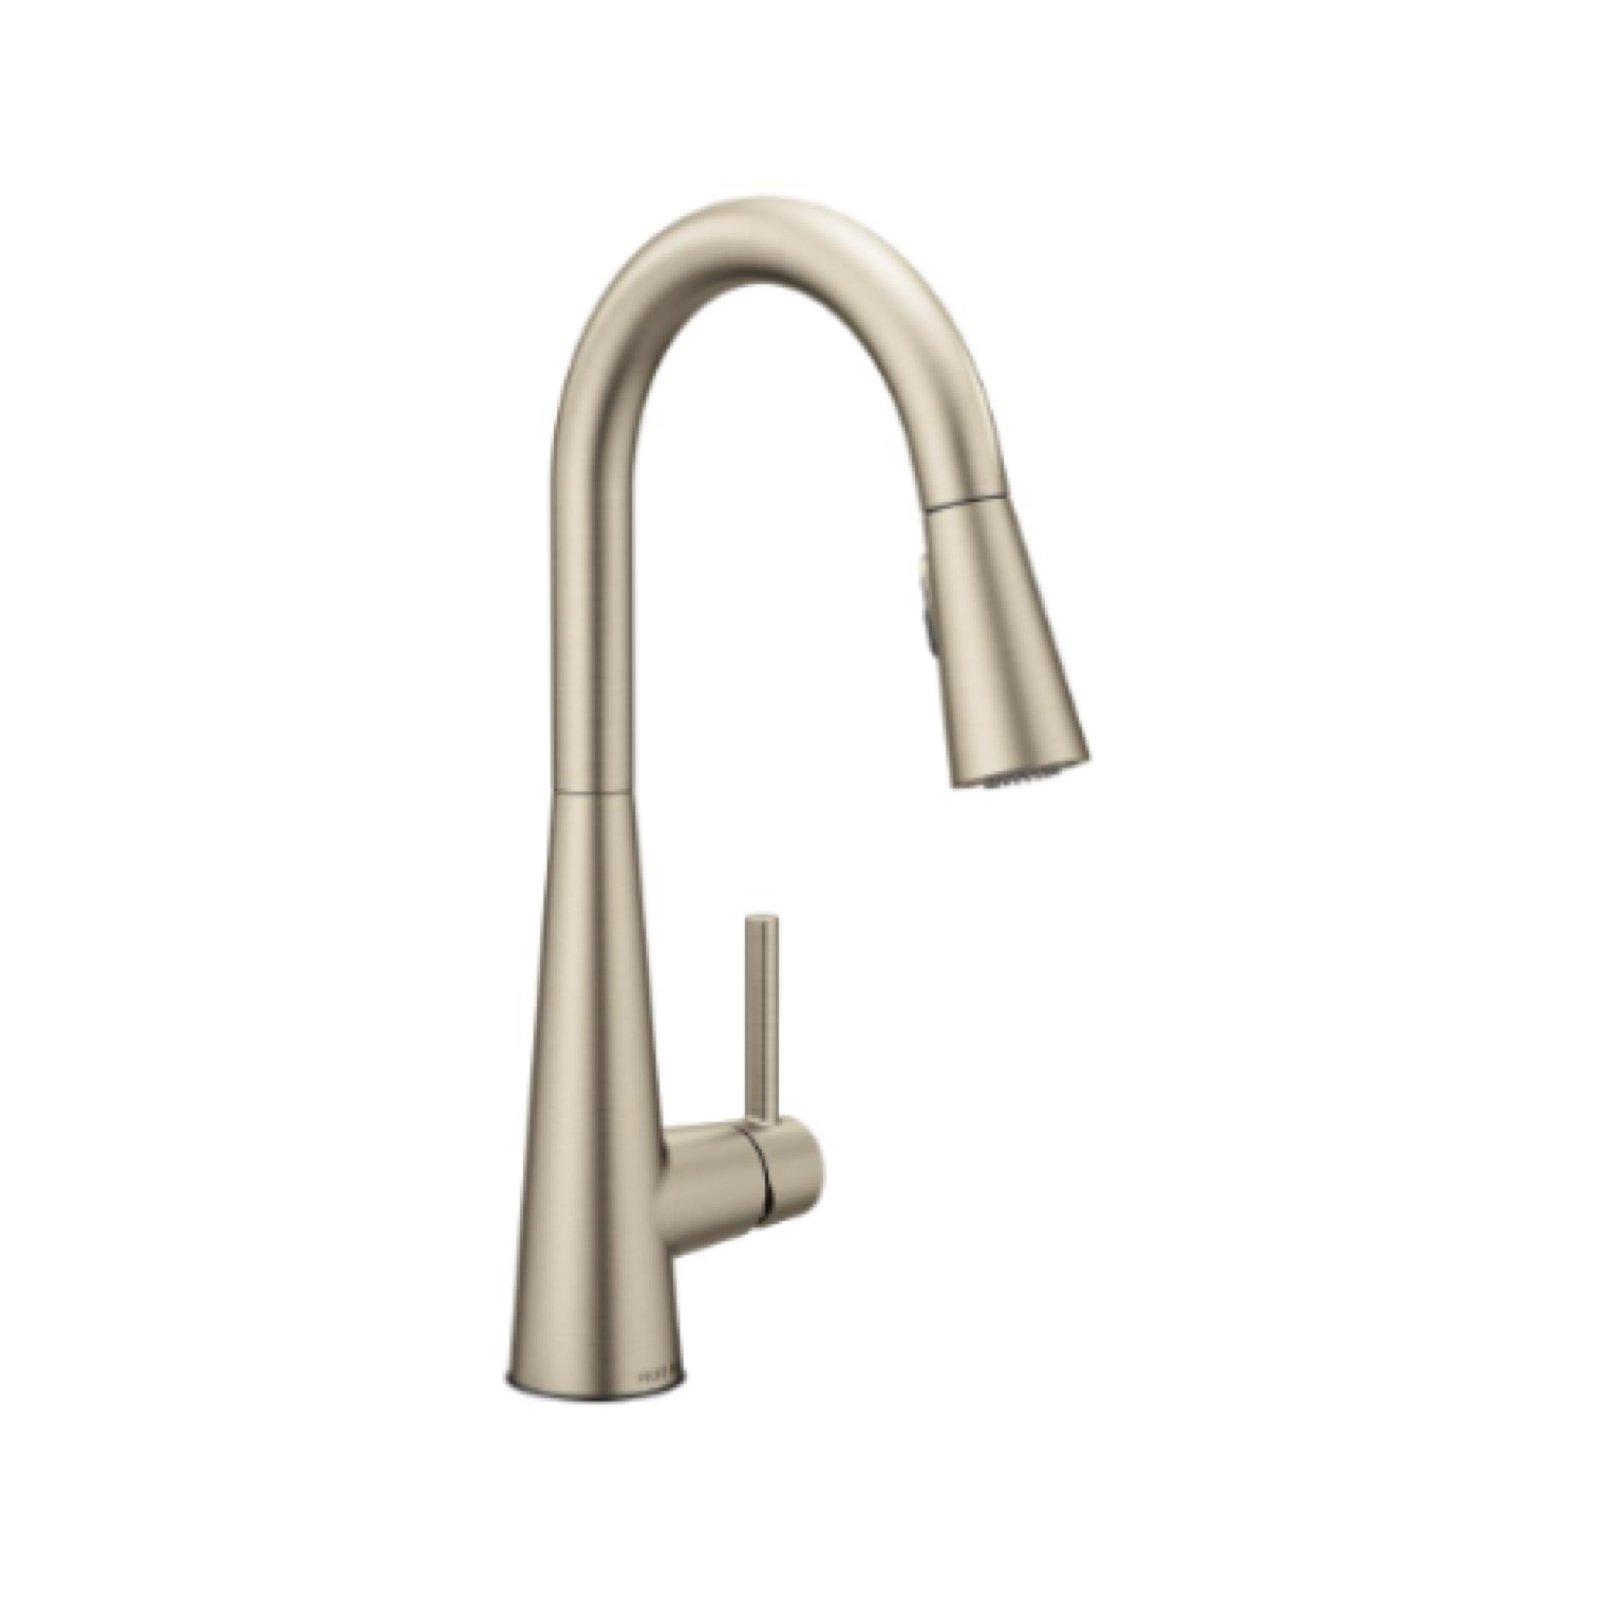 Moen Sleek Single Handle Pull-Down Kitchen Faucet by Hausera ...